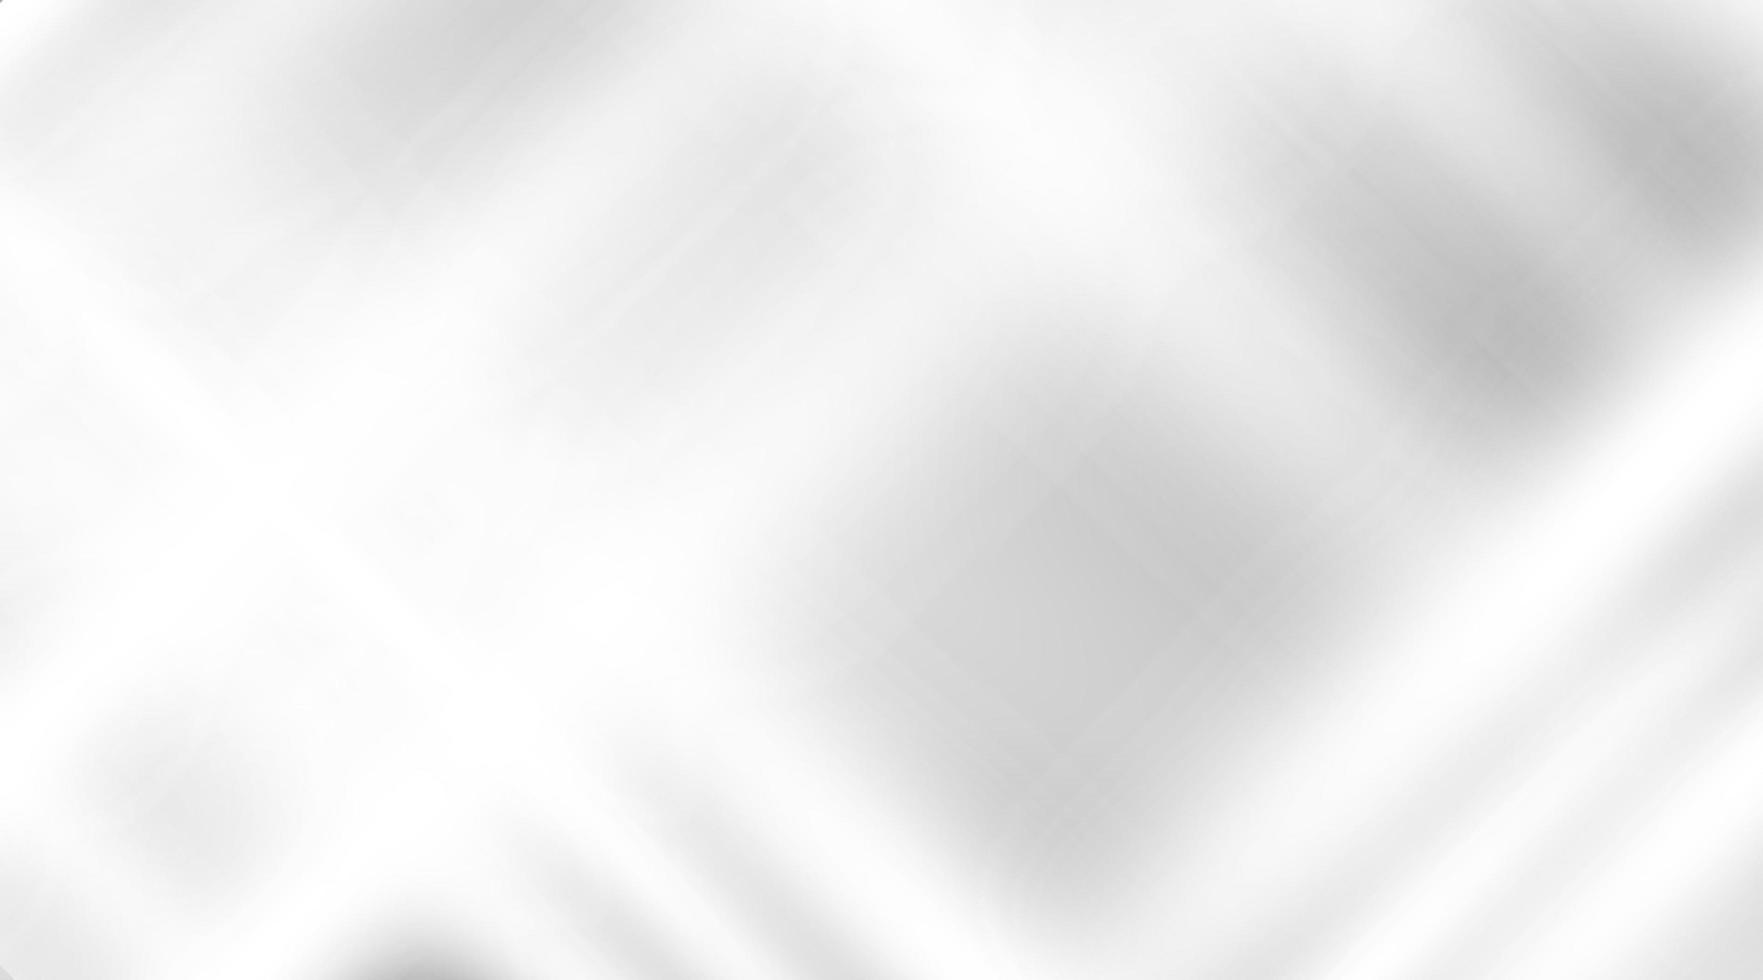 Fondo de acero inoxidable de hierro de reflexión vectorial, diseño moderno de orzuelo. vector